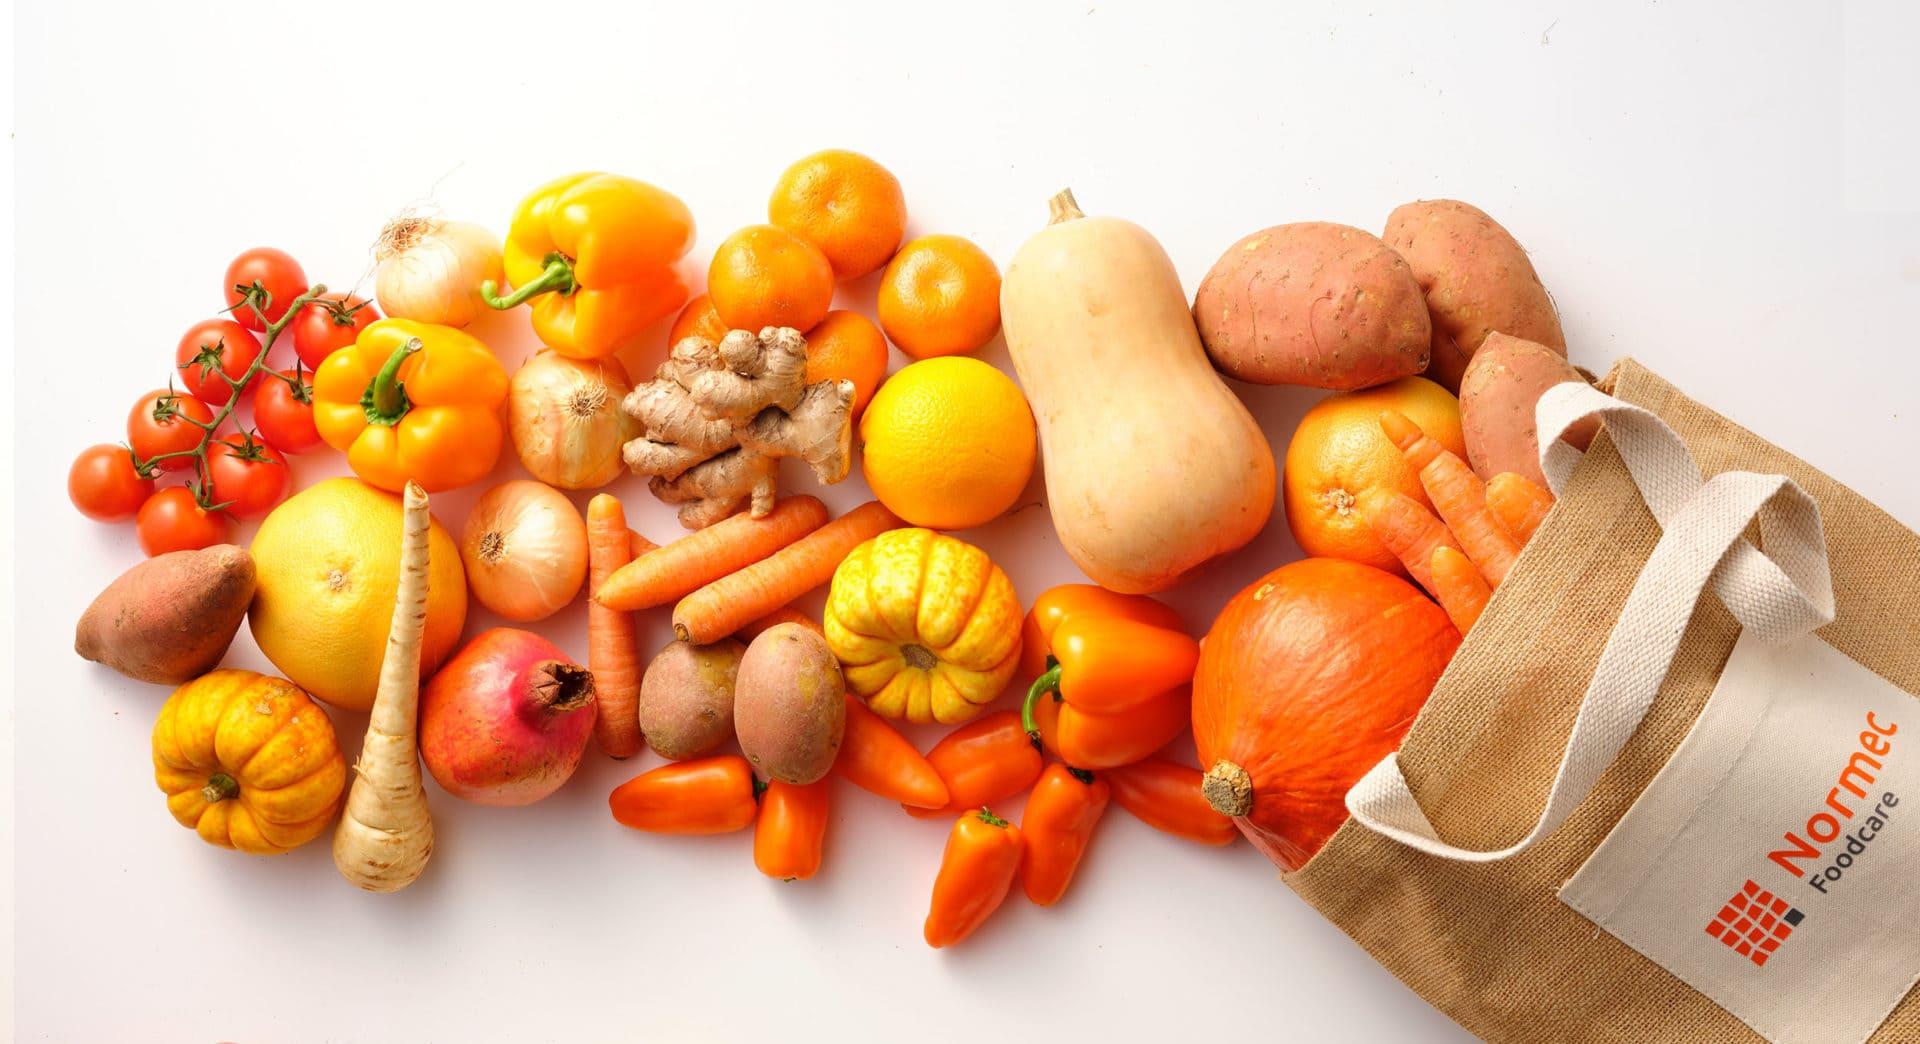 oranje fruit en groentes normec foodcare